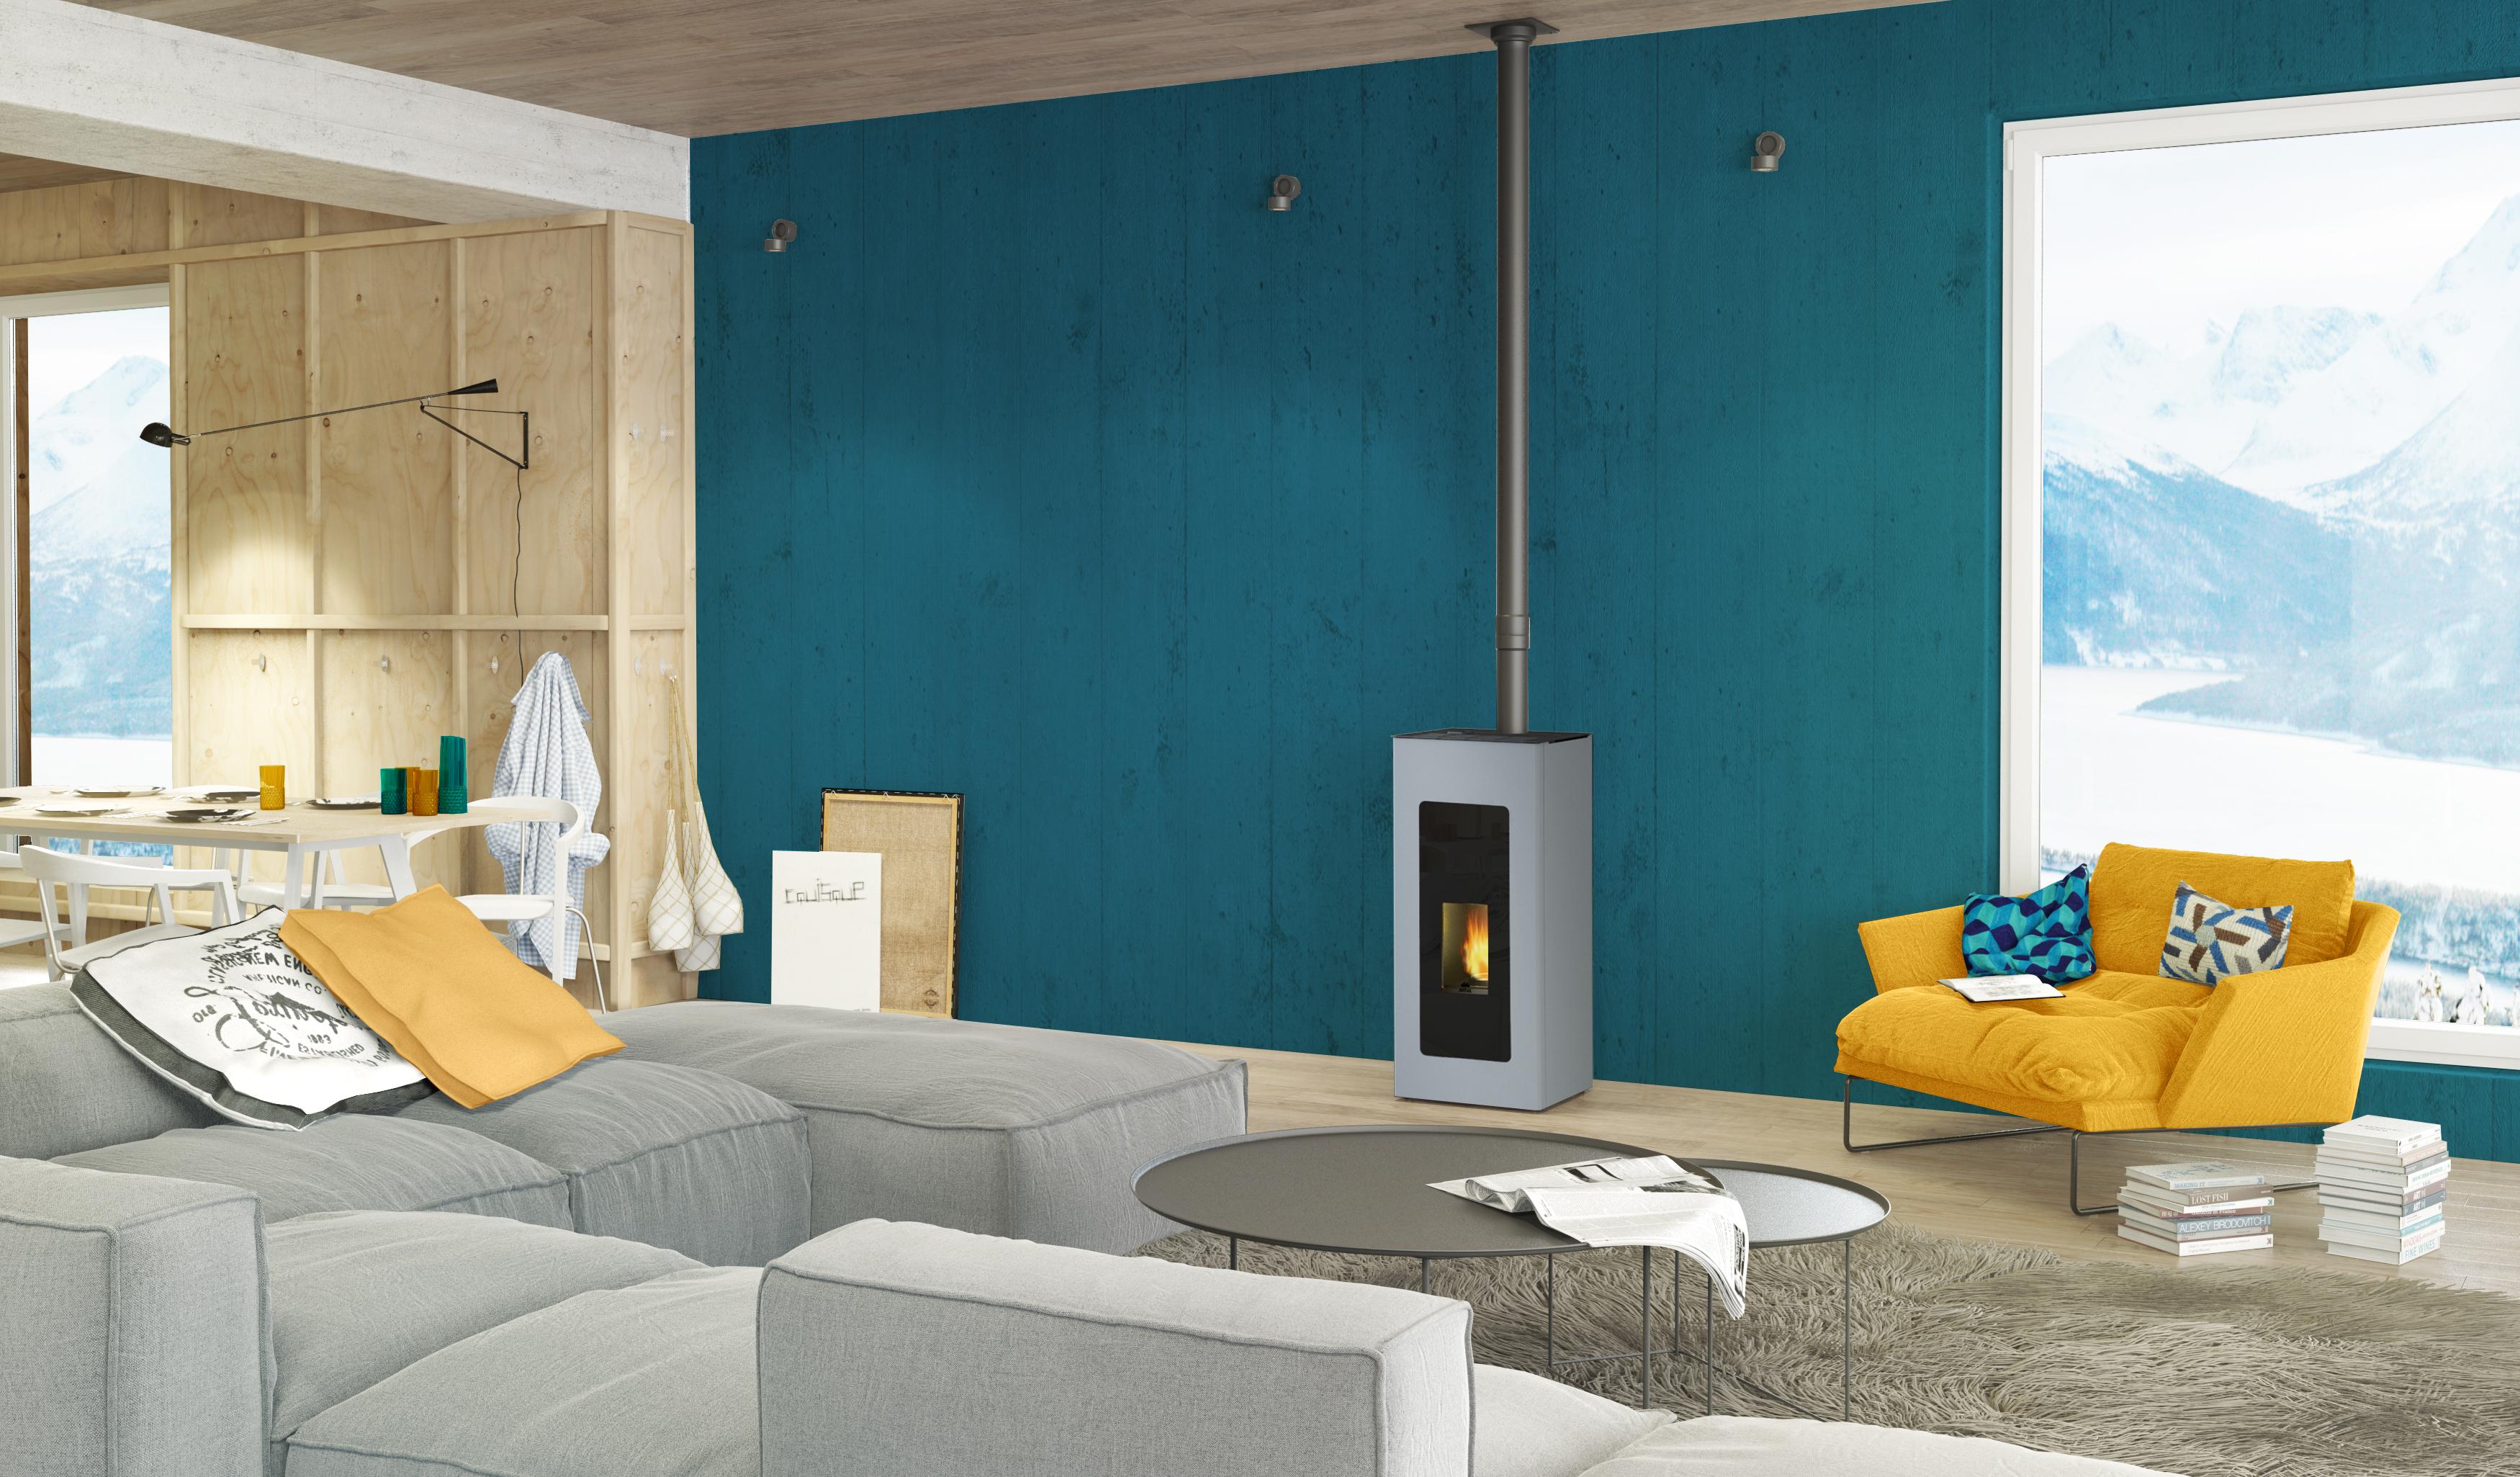 jotul pf931 chemin es serrano. Black Bedroom Furniture Sets. Home Design Ideas